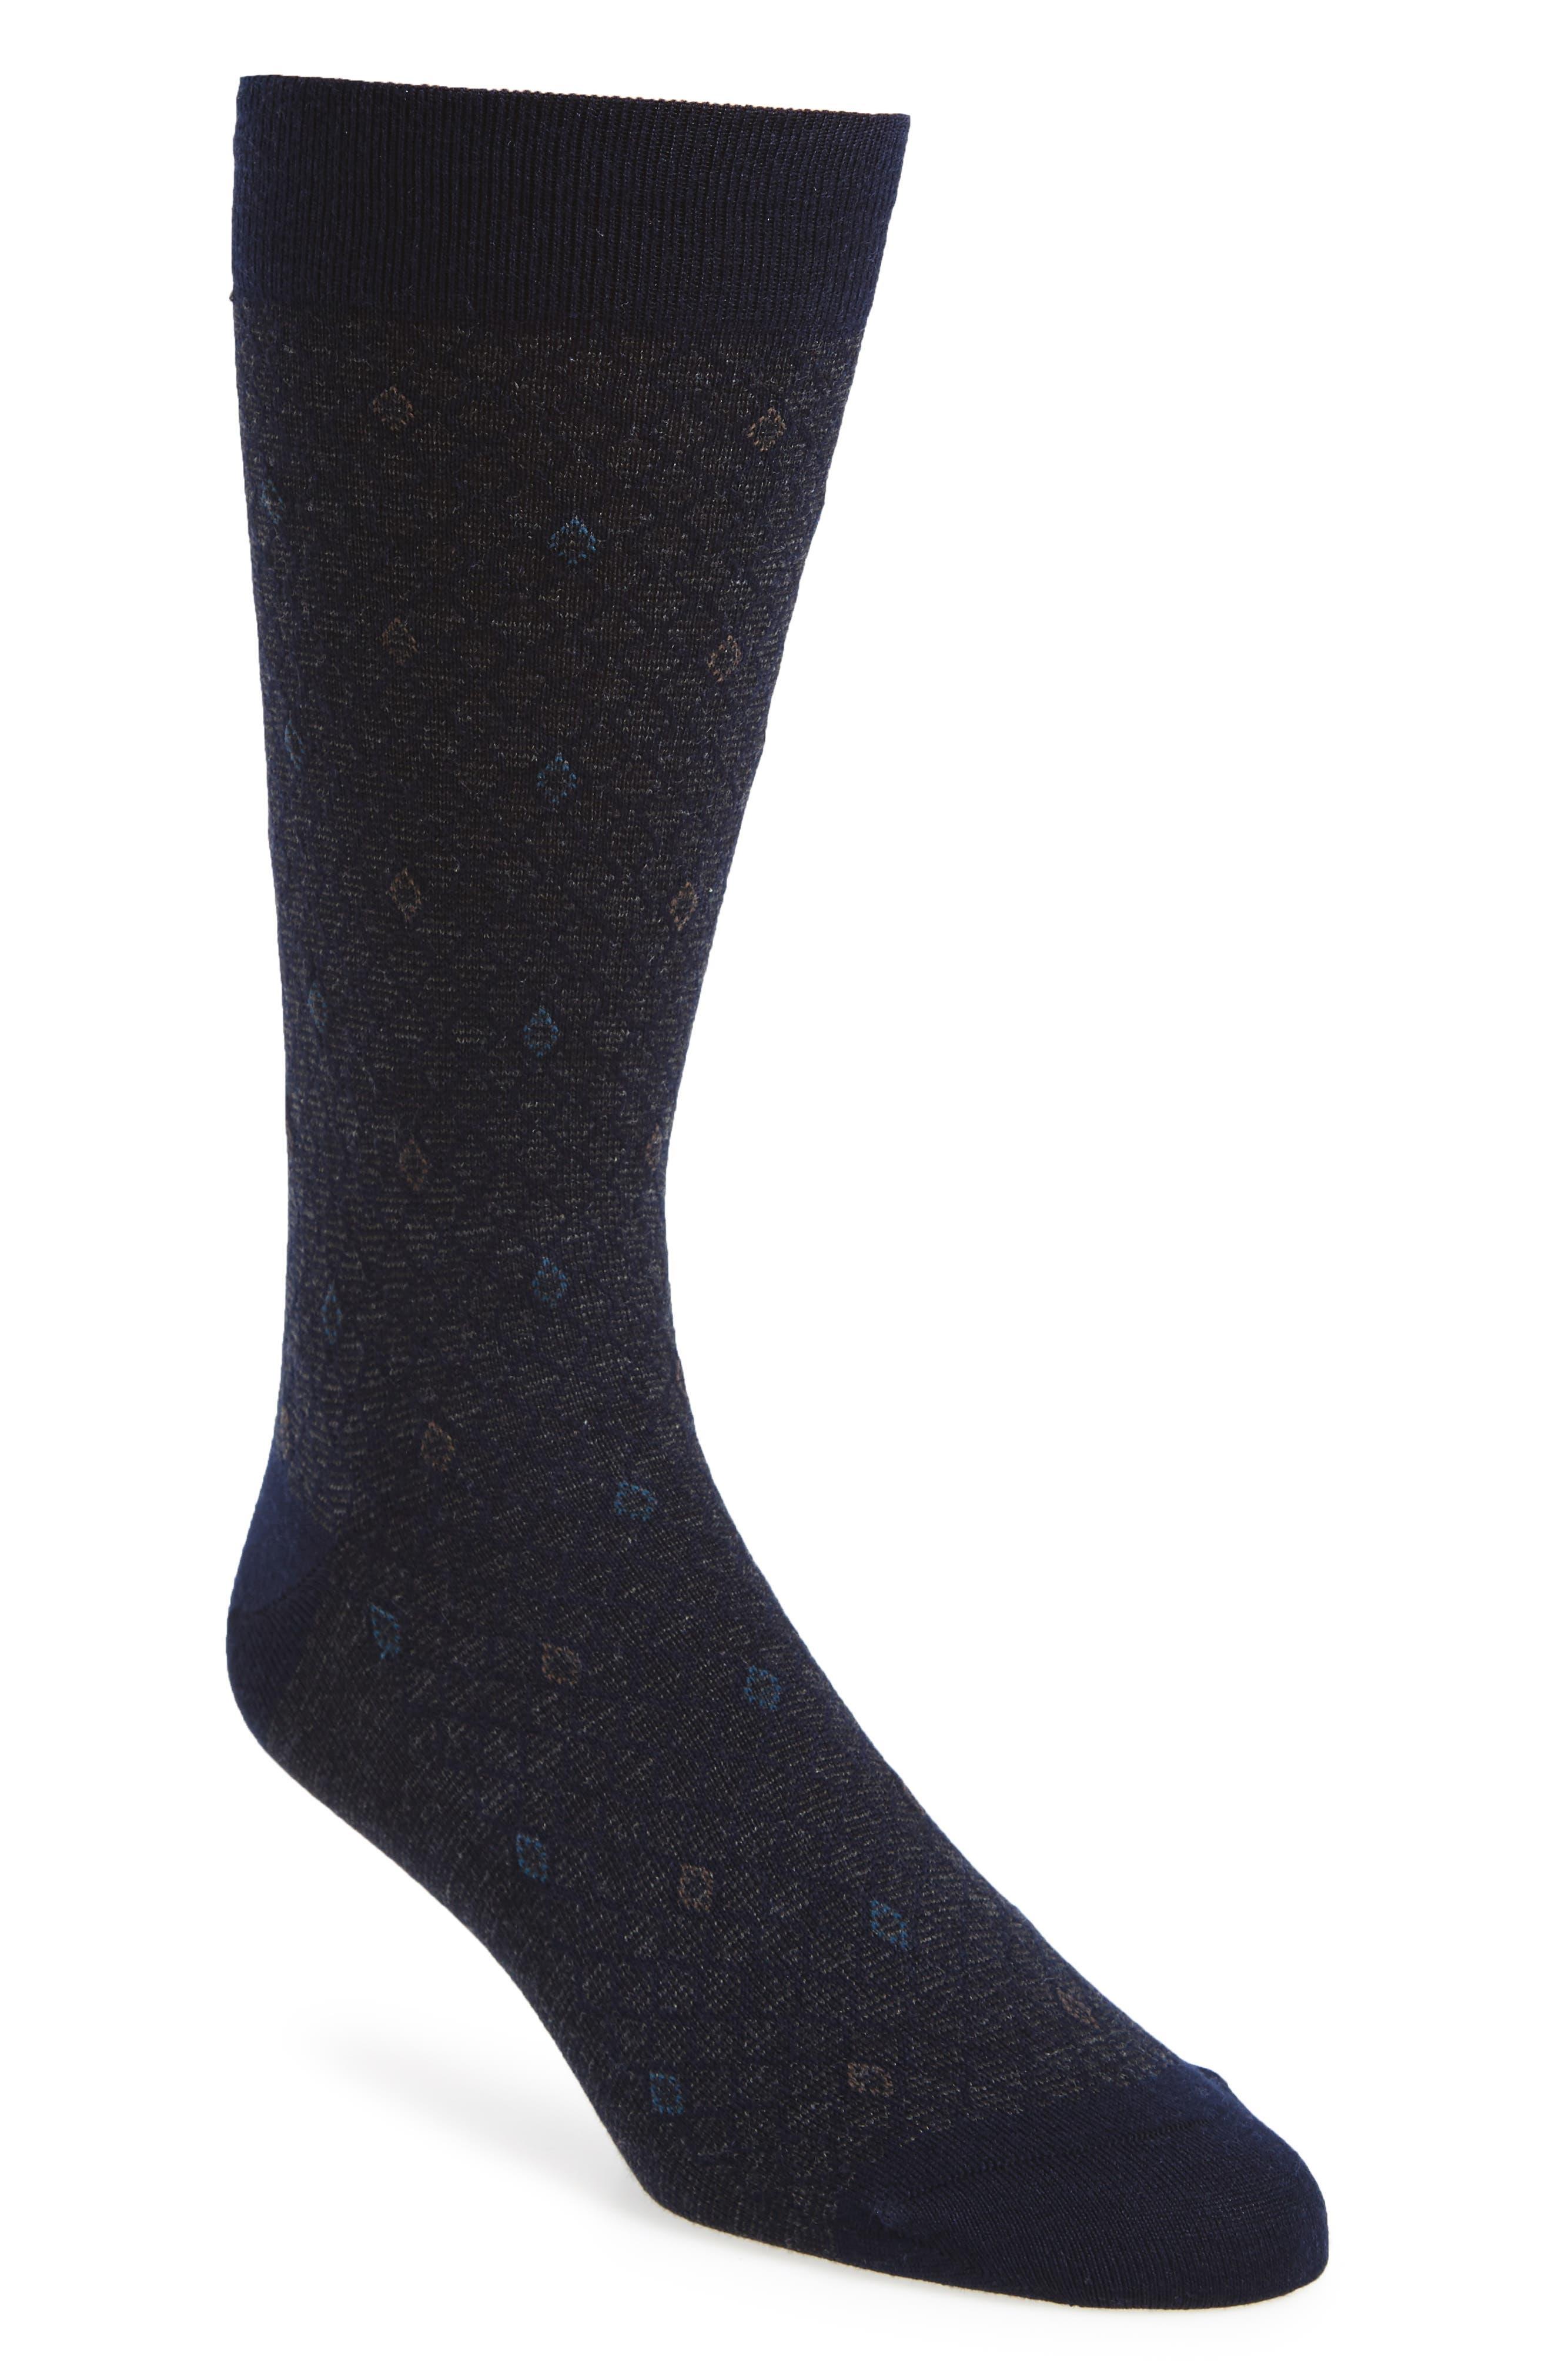 Diamond Wool Blend Socks,                             Main thumbnail 1, color,                             Navy